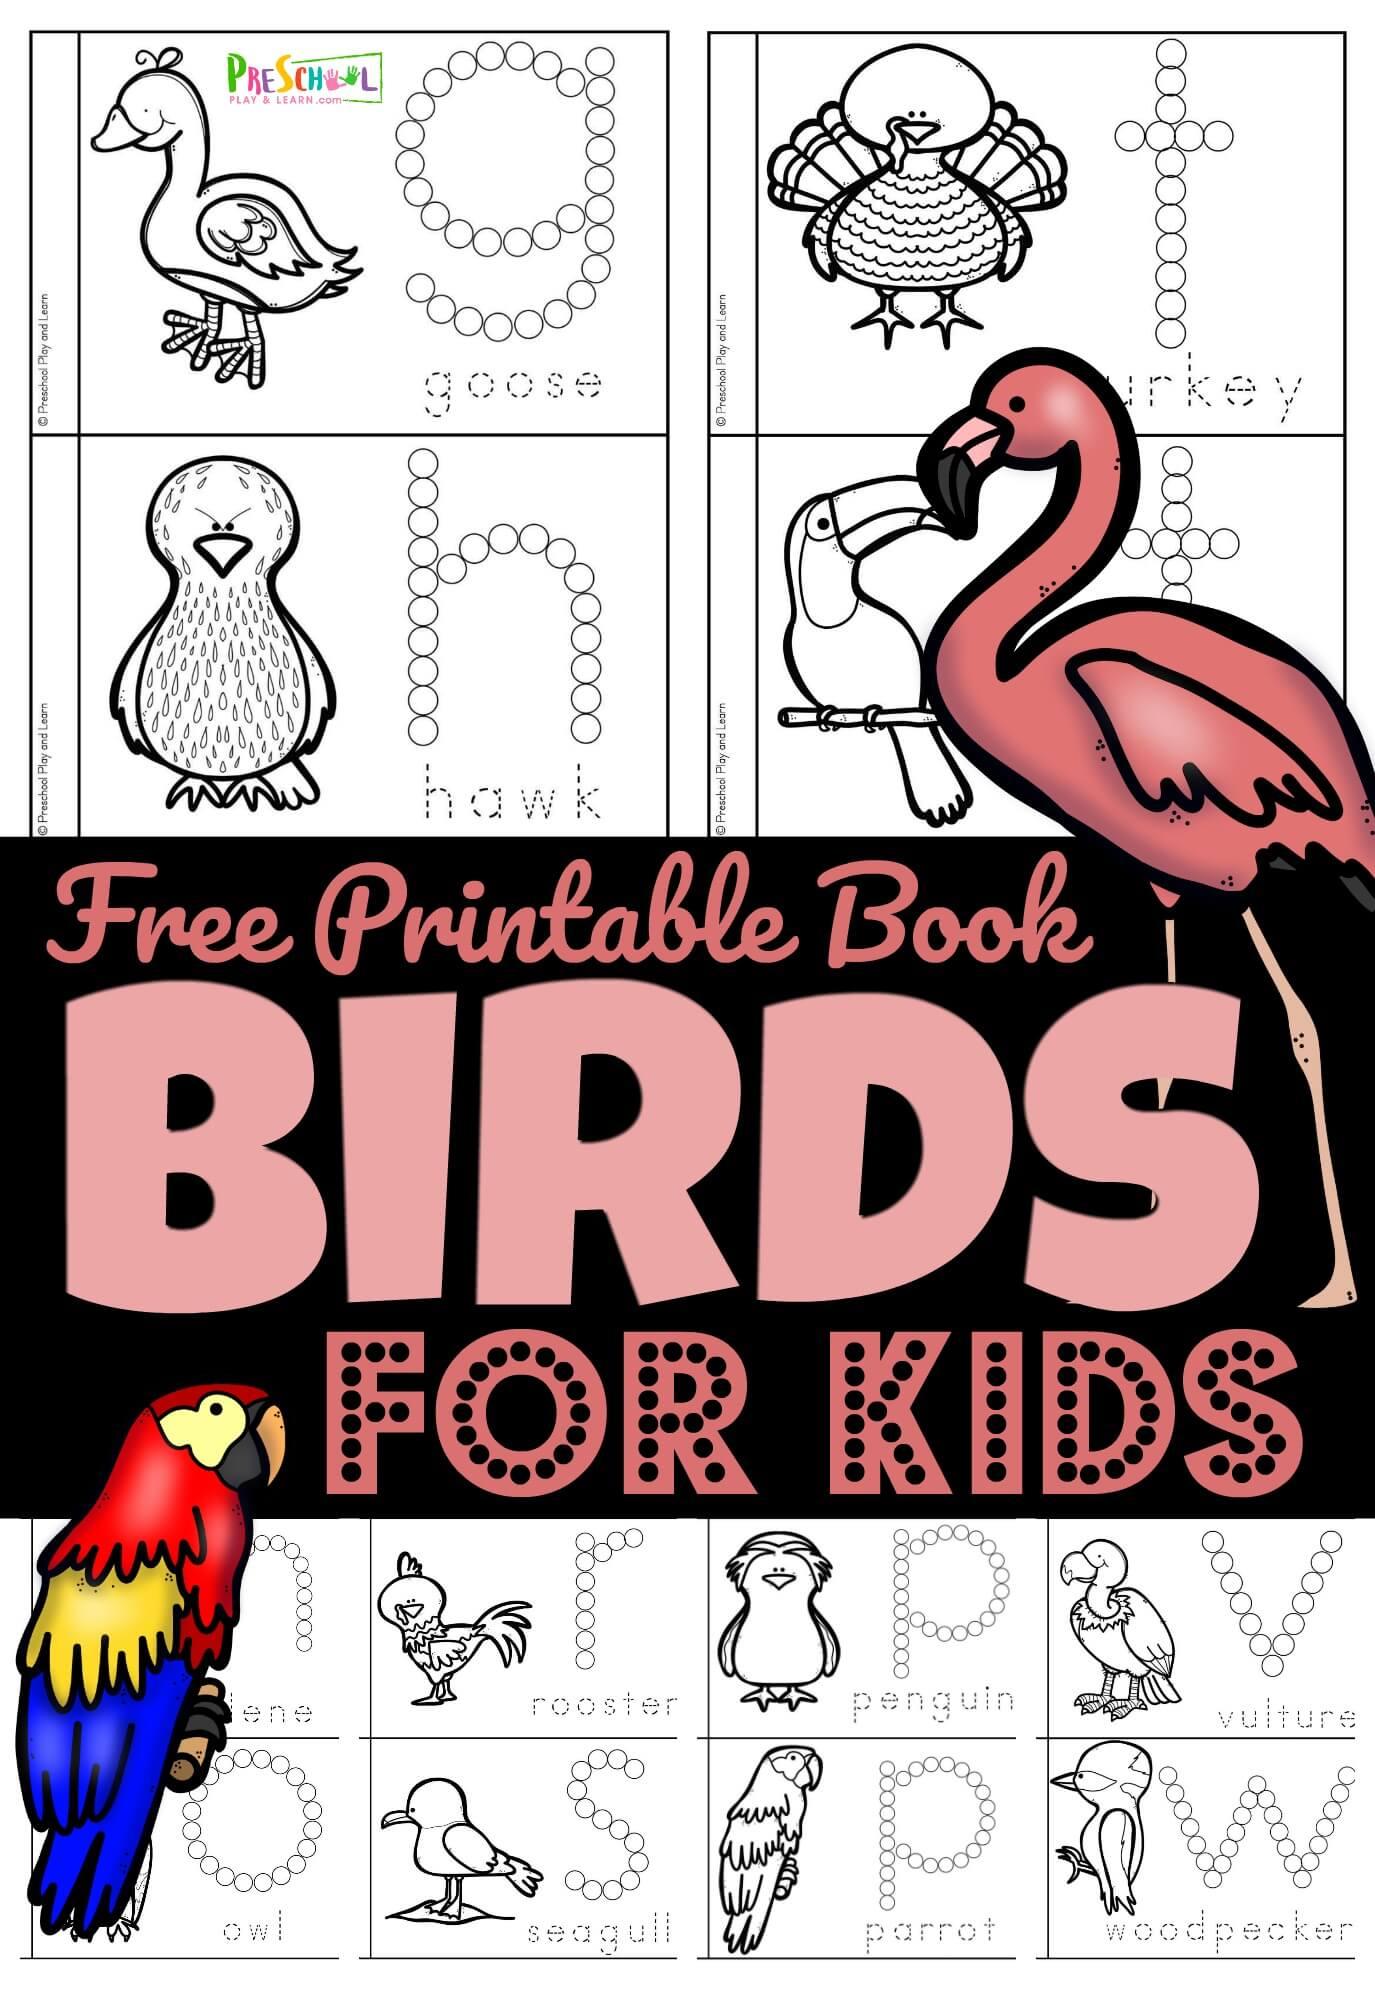 Free Birds For Preschoolers Printable Book